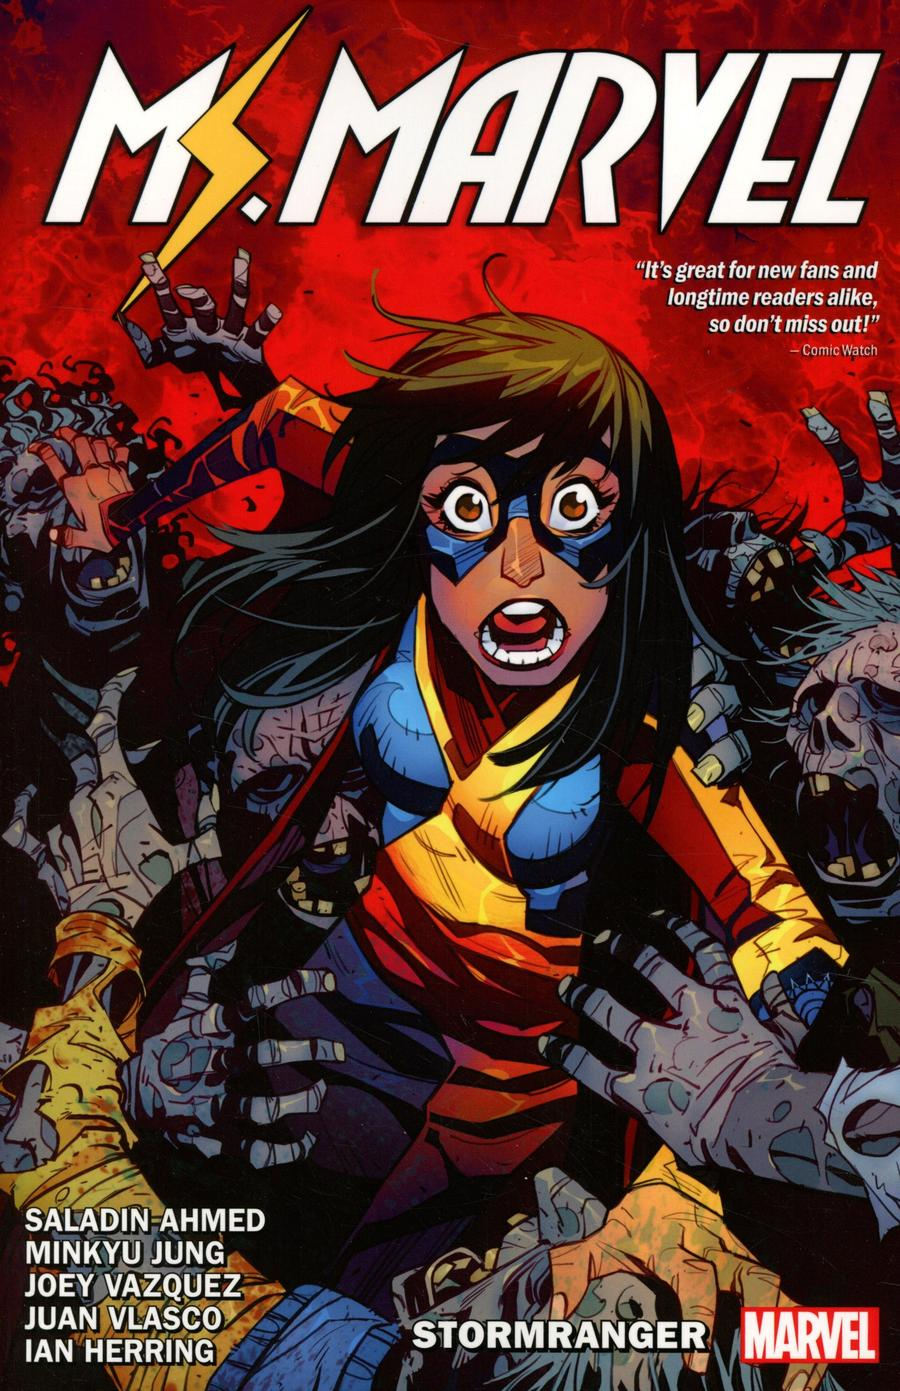 Ms Marvel By Saladin Ahmed Vol 2 Stormranger TP